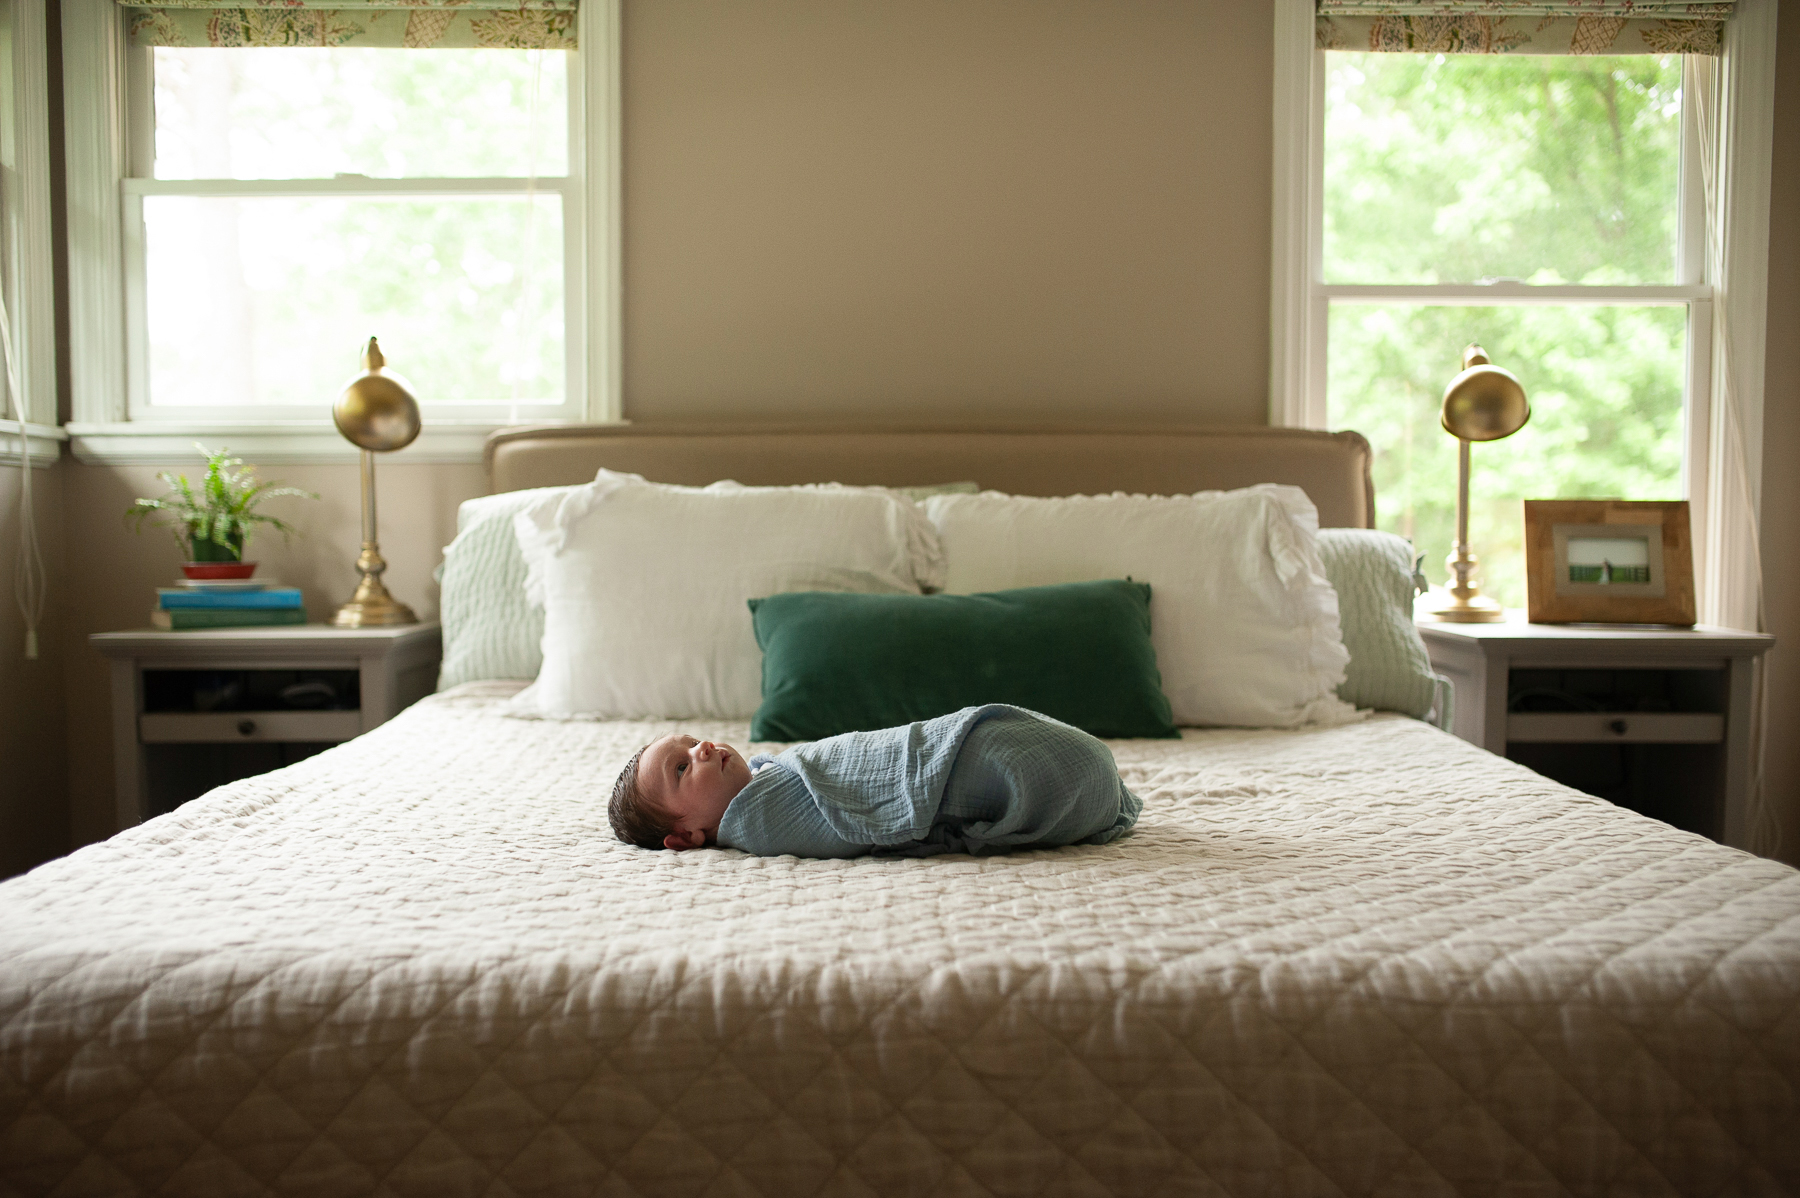 ClaireElisePhotography_Newborn-77.jpg